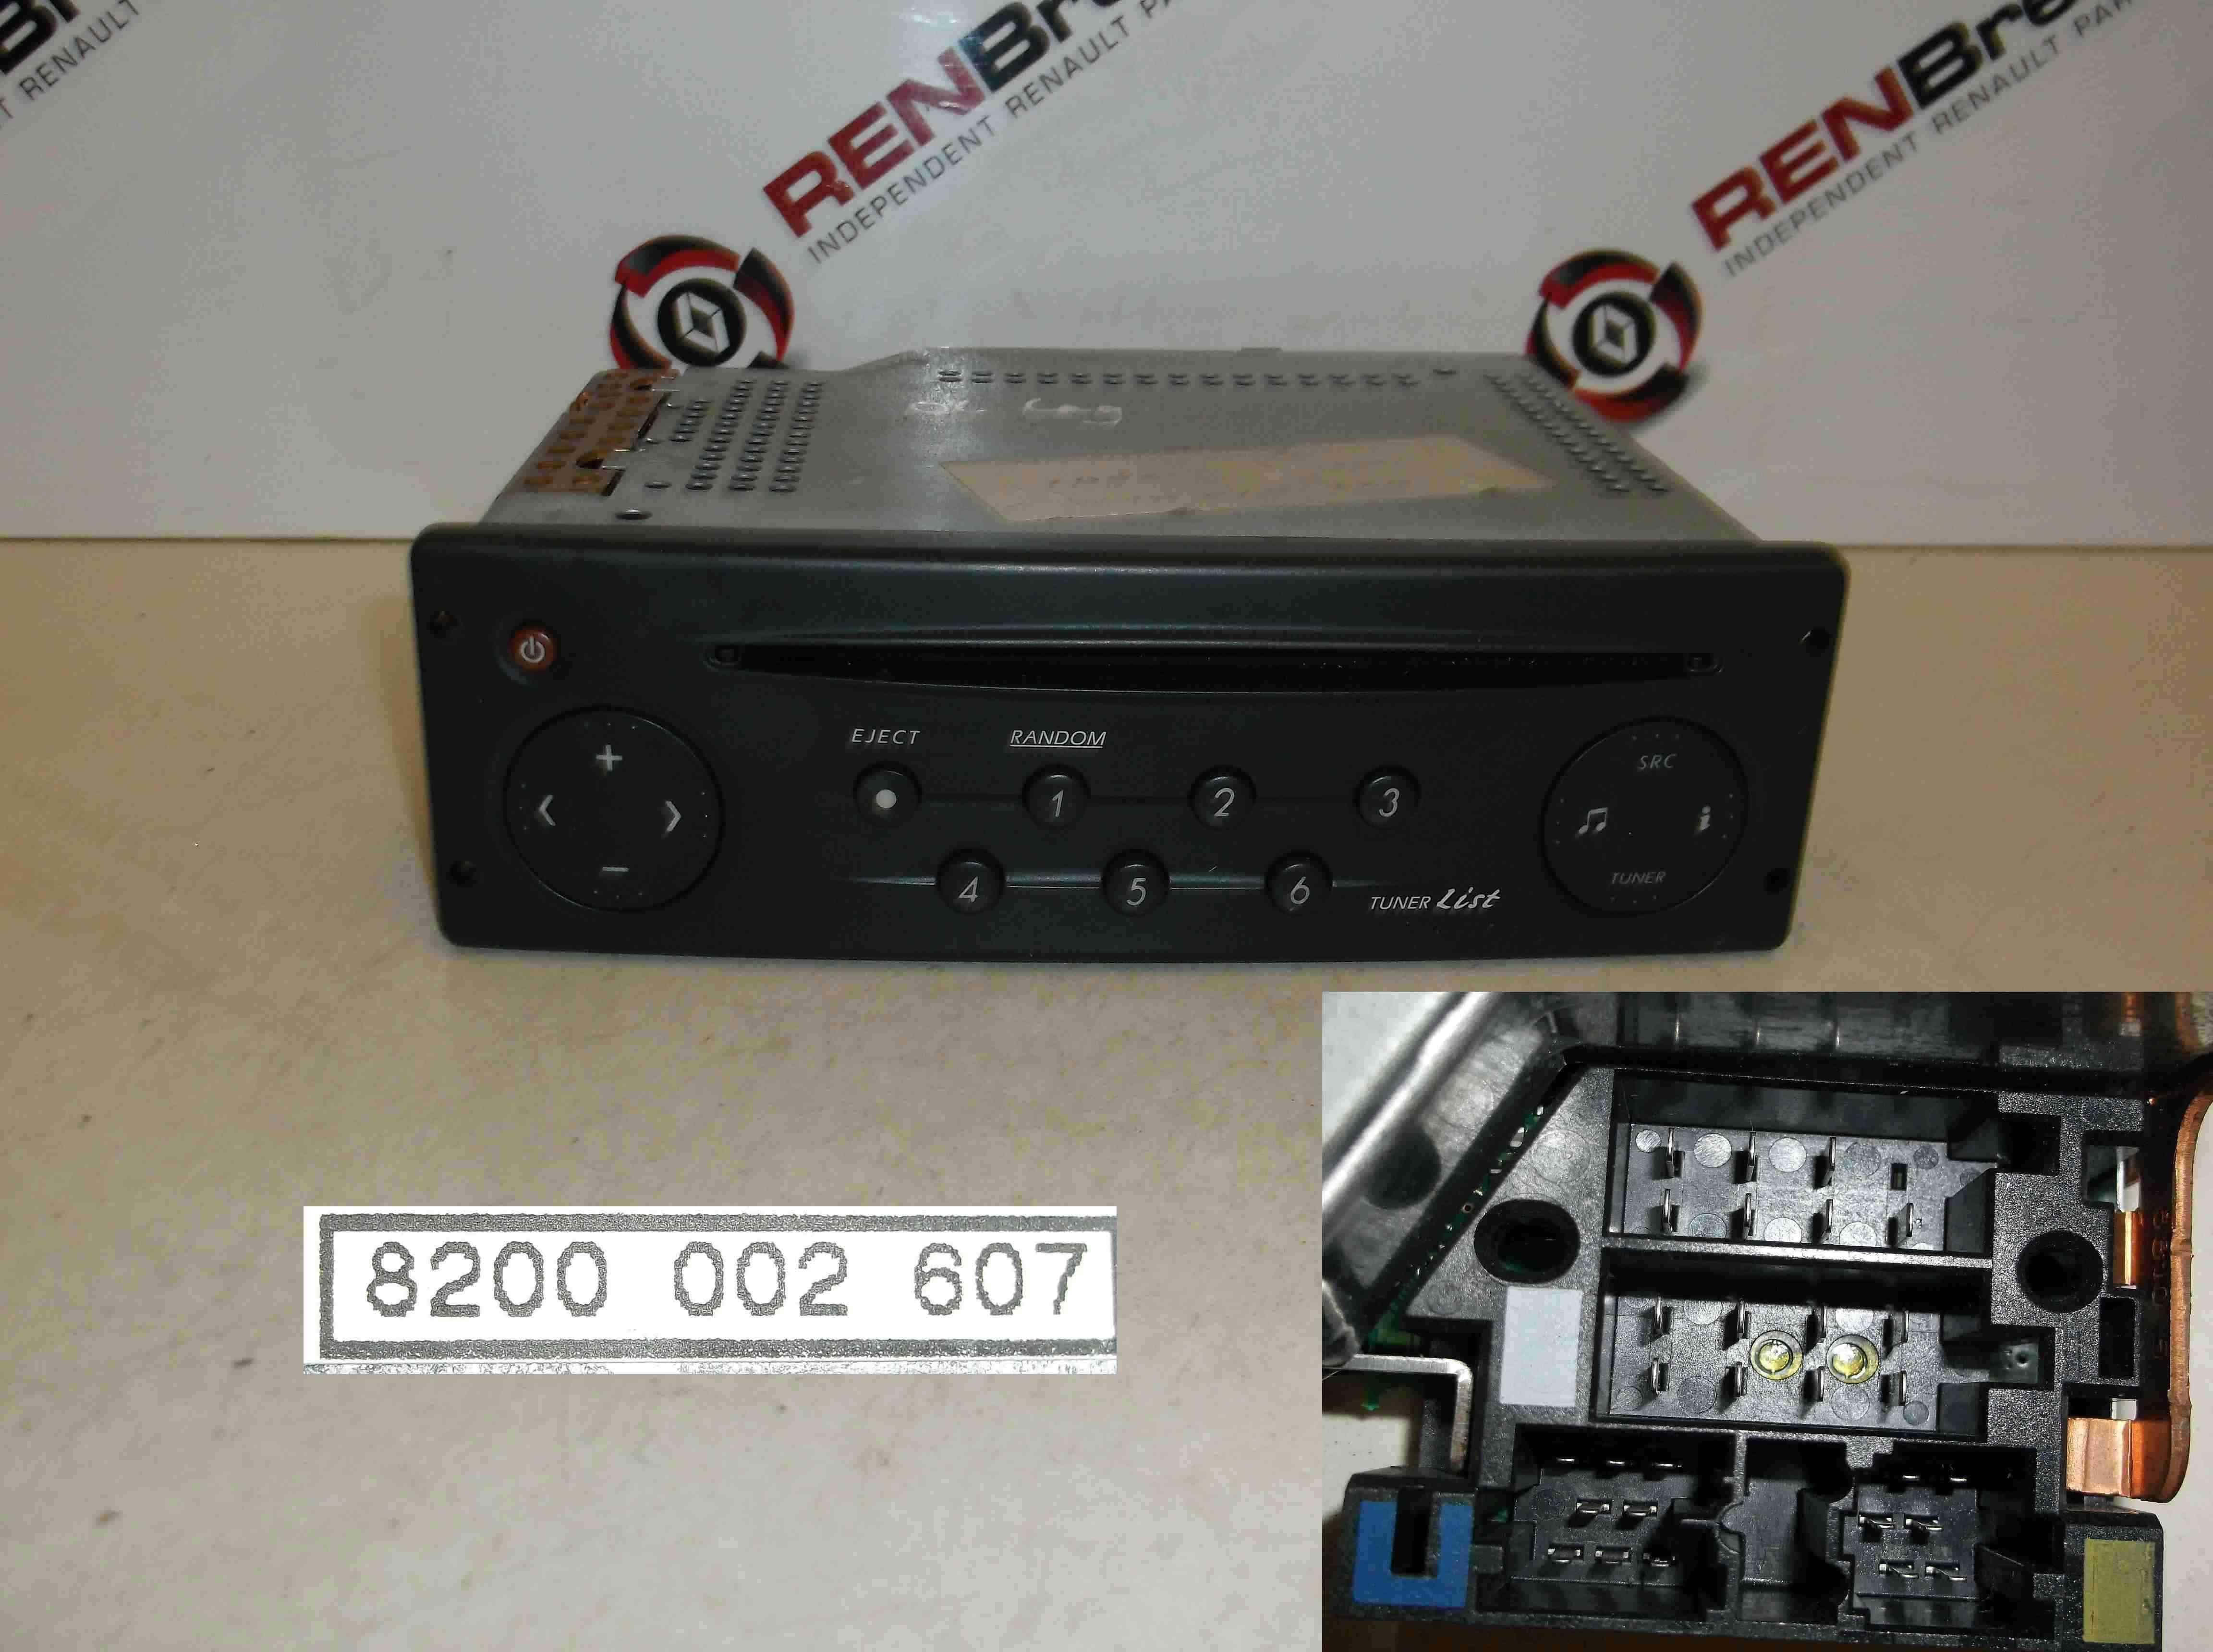 renault laguna 2001 2005 cd player radio tuner list with code 8200002607 ebay. Black Bedroom Furniture Sets. Home Design Ideas